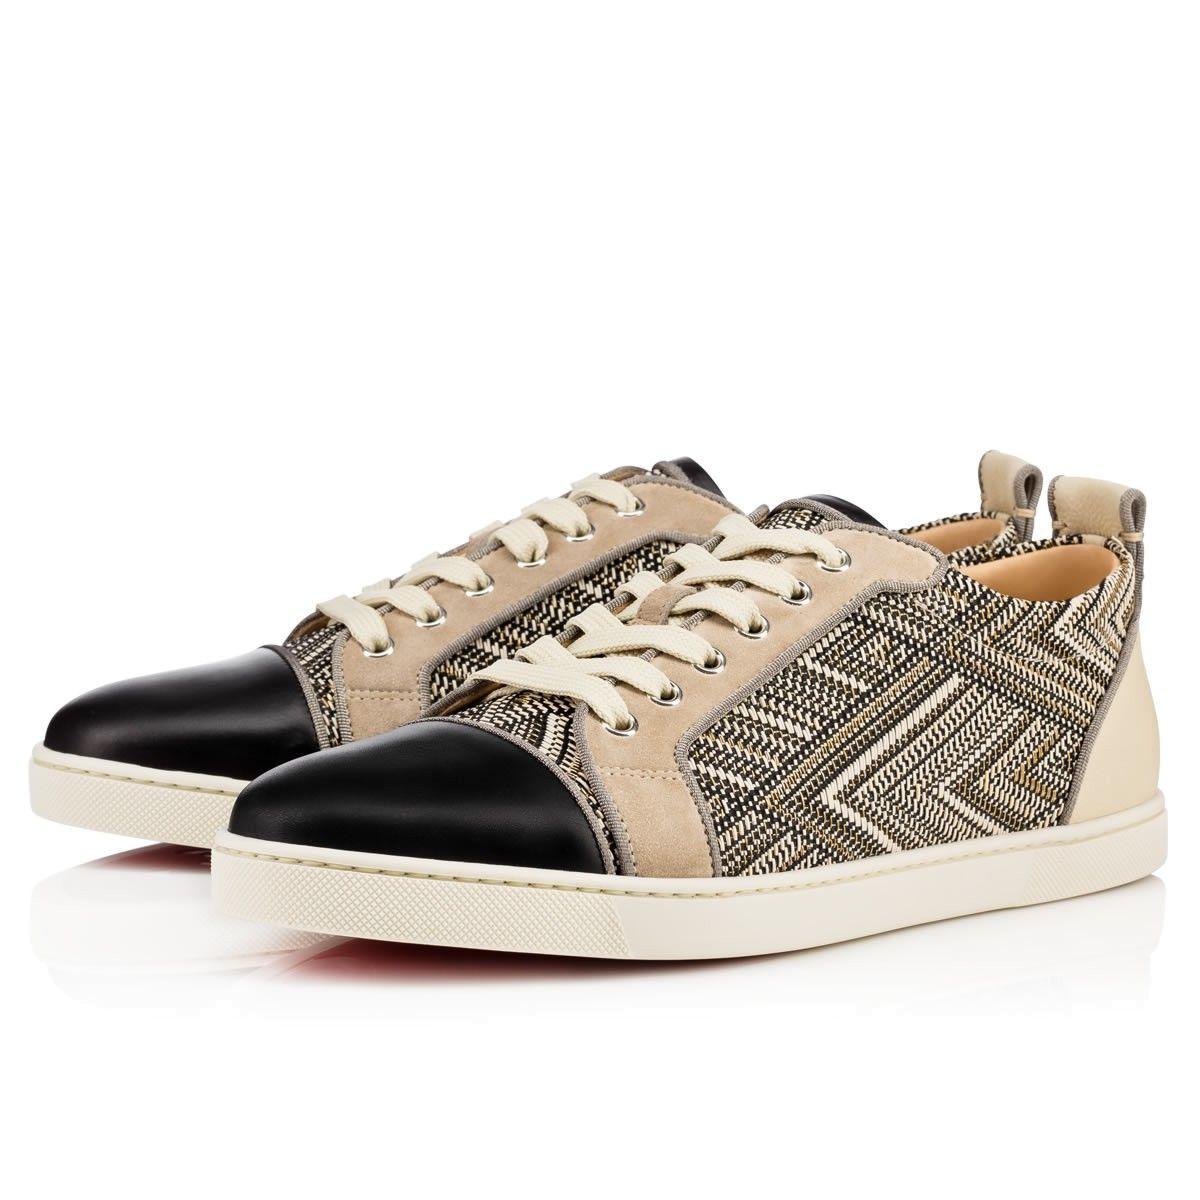 37e0a18b31d0 CHRISTIAN LOUBOUTIN Gondolier Orlato Flat Black Ivory Rafia - Men Shoes - Christian  Louboutin.  christianlouboutin  shoes